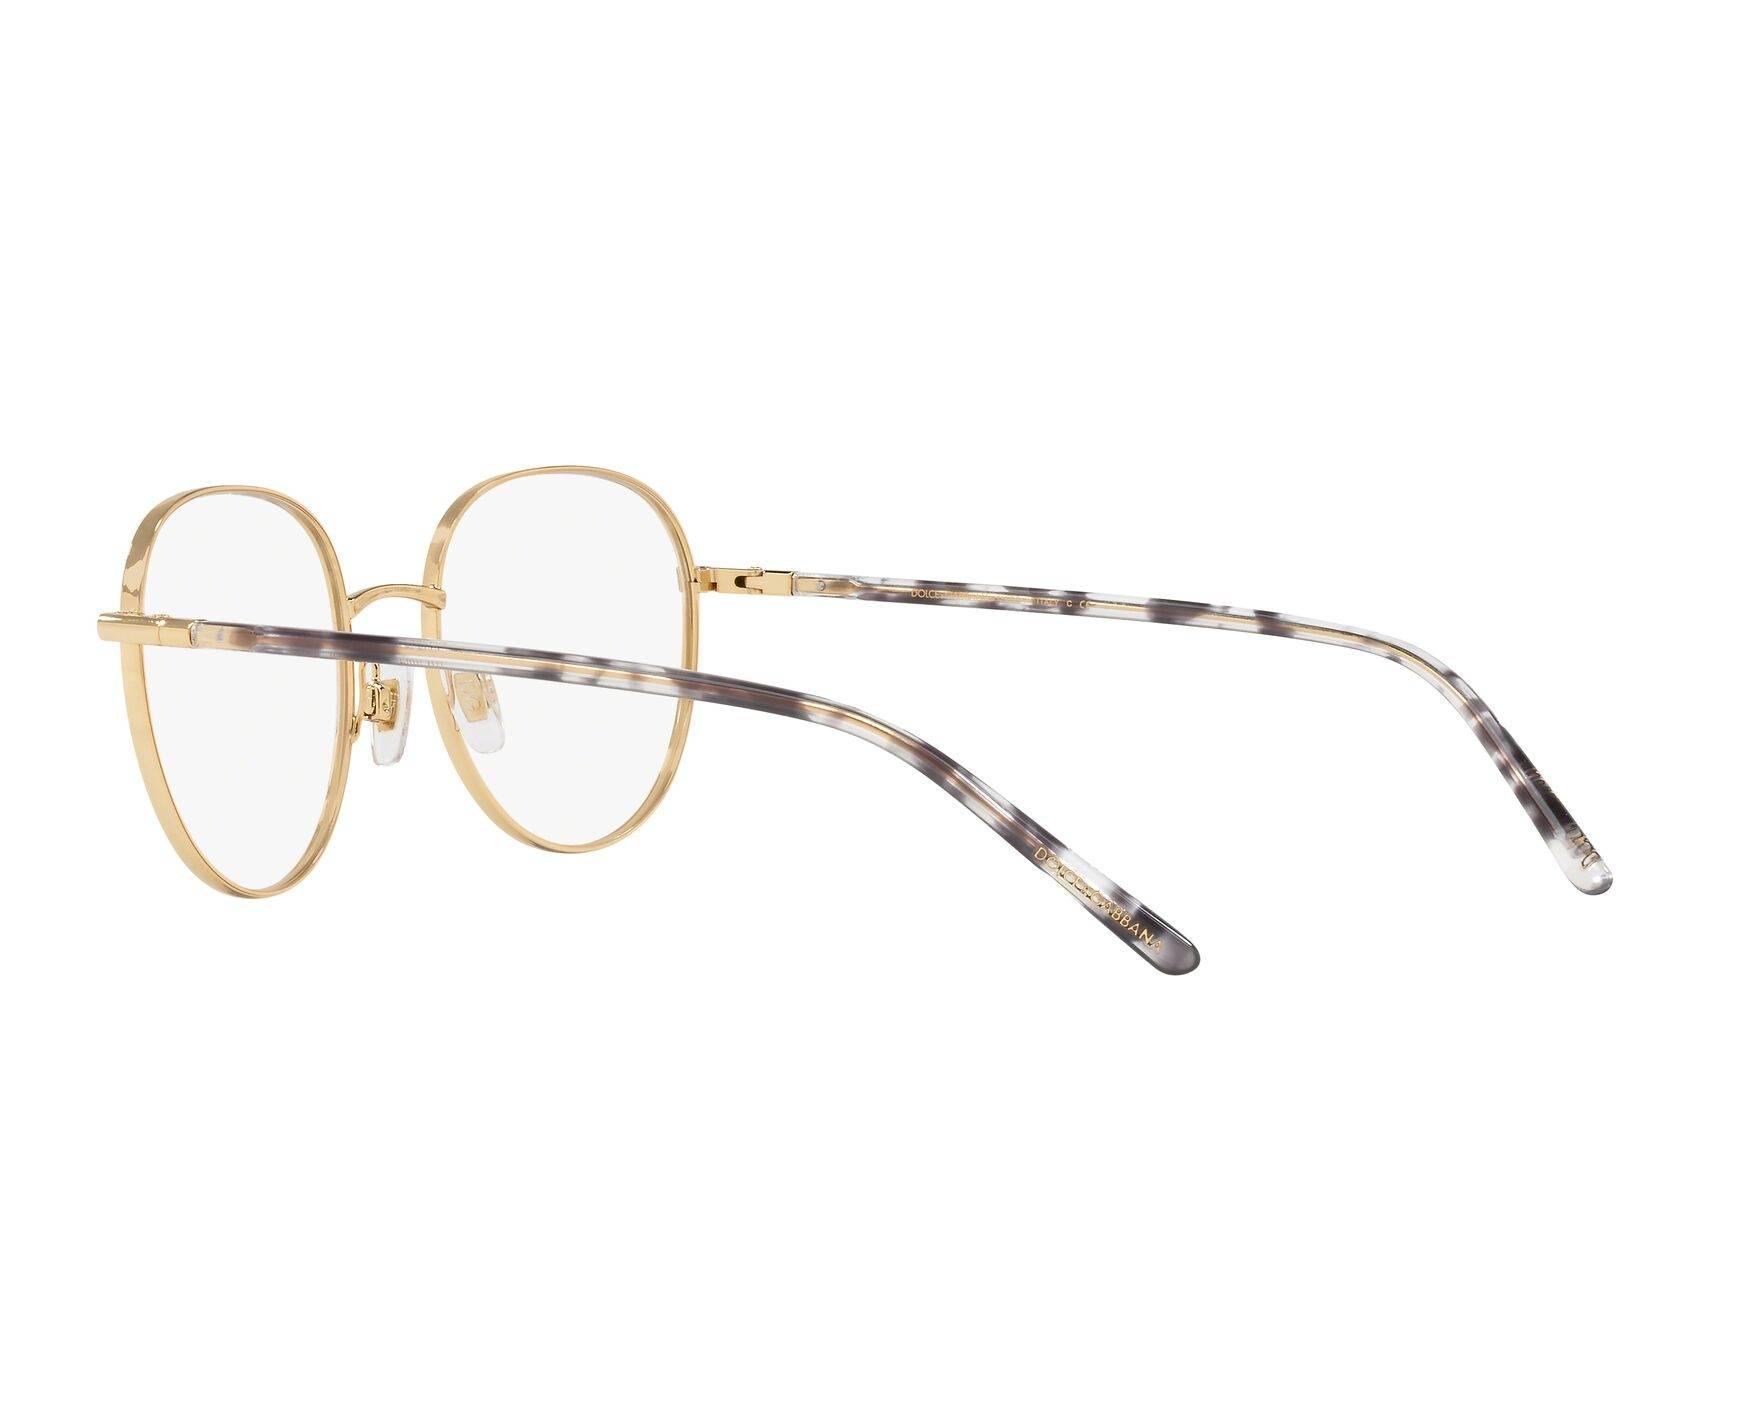 Dolce & Gabbana Glasses DG-1304 02